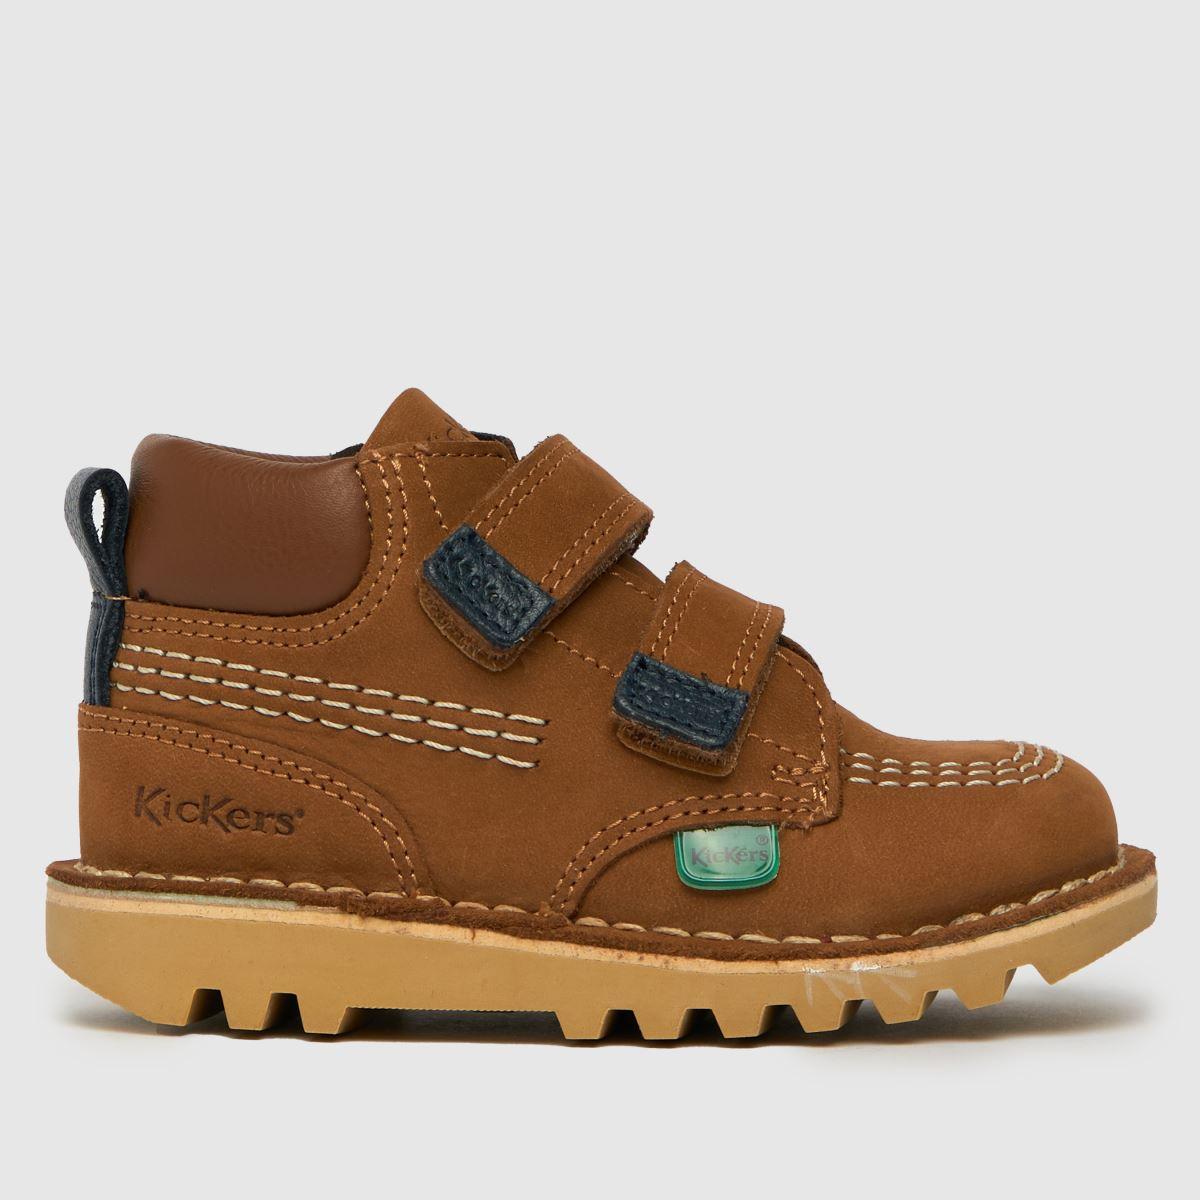 Kickers Tan Hi Roll Boots Toddler